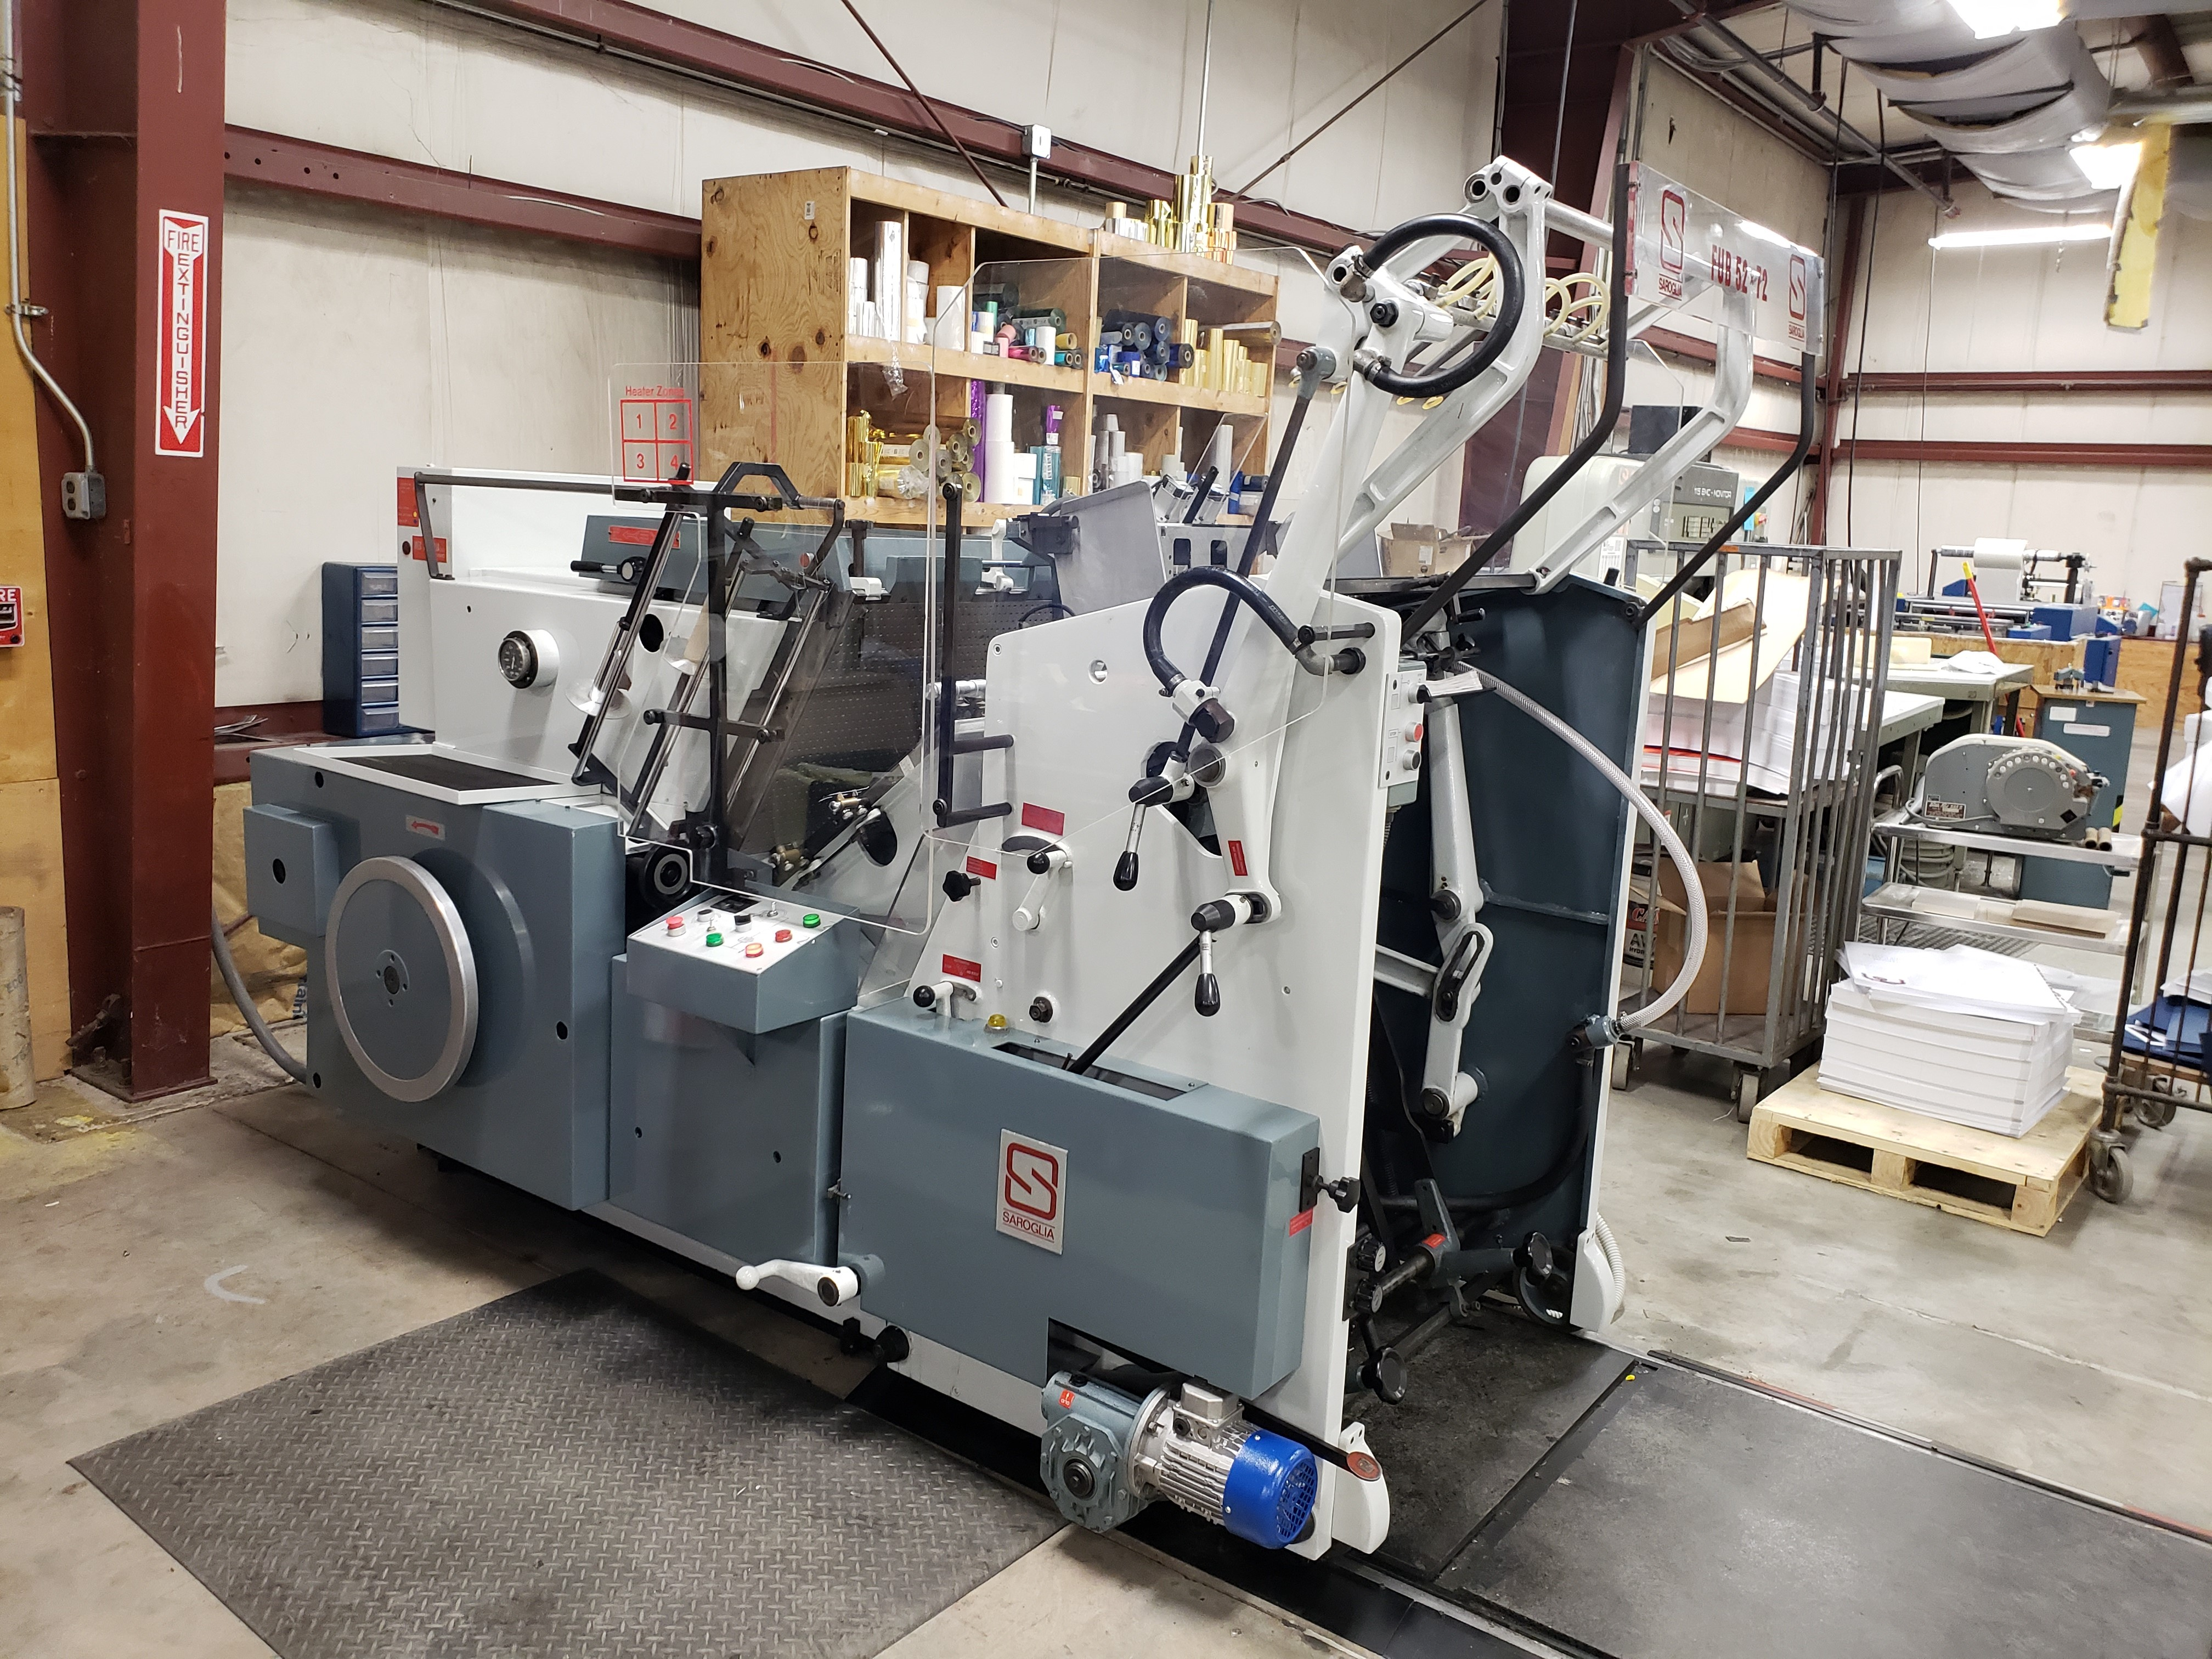 Factory Rebuilt Saroglia Machine For Sale